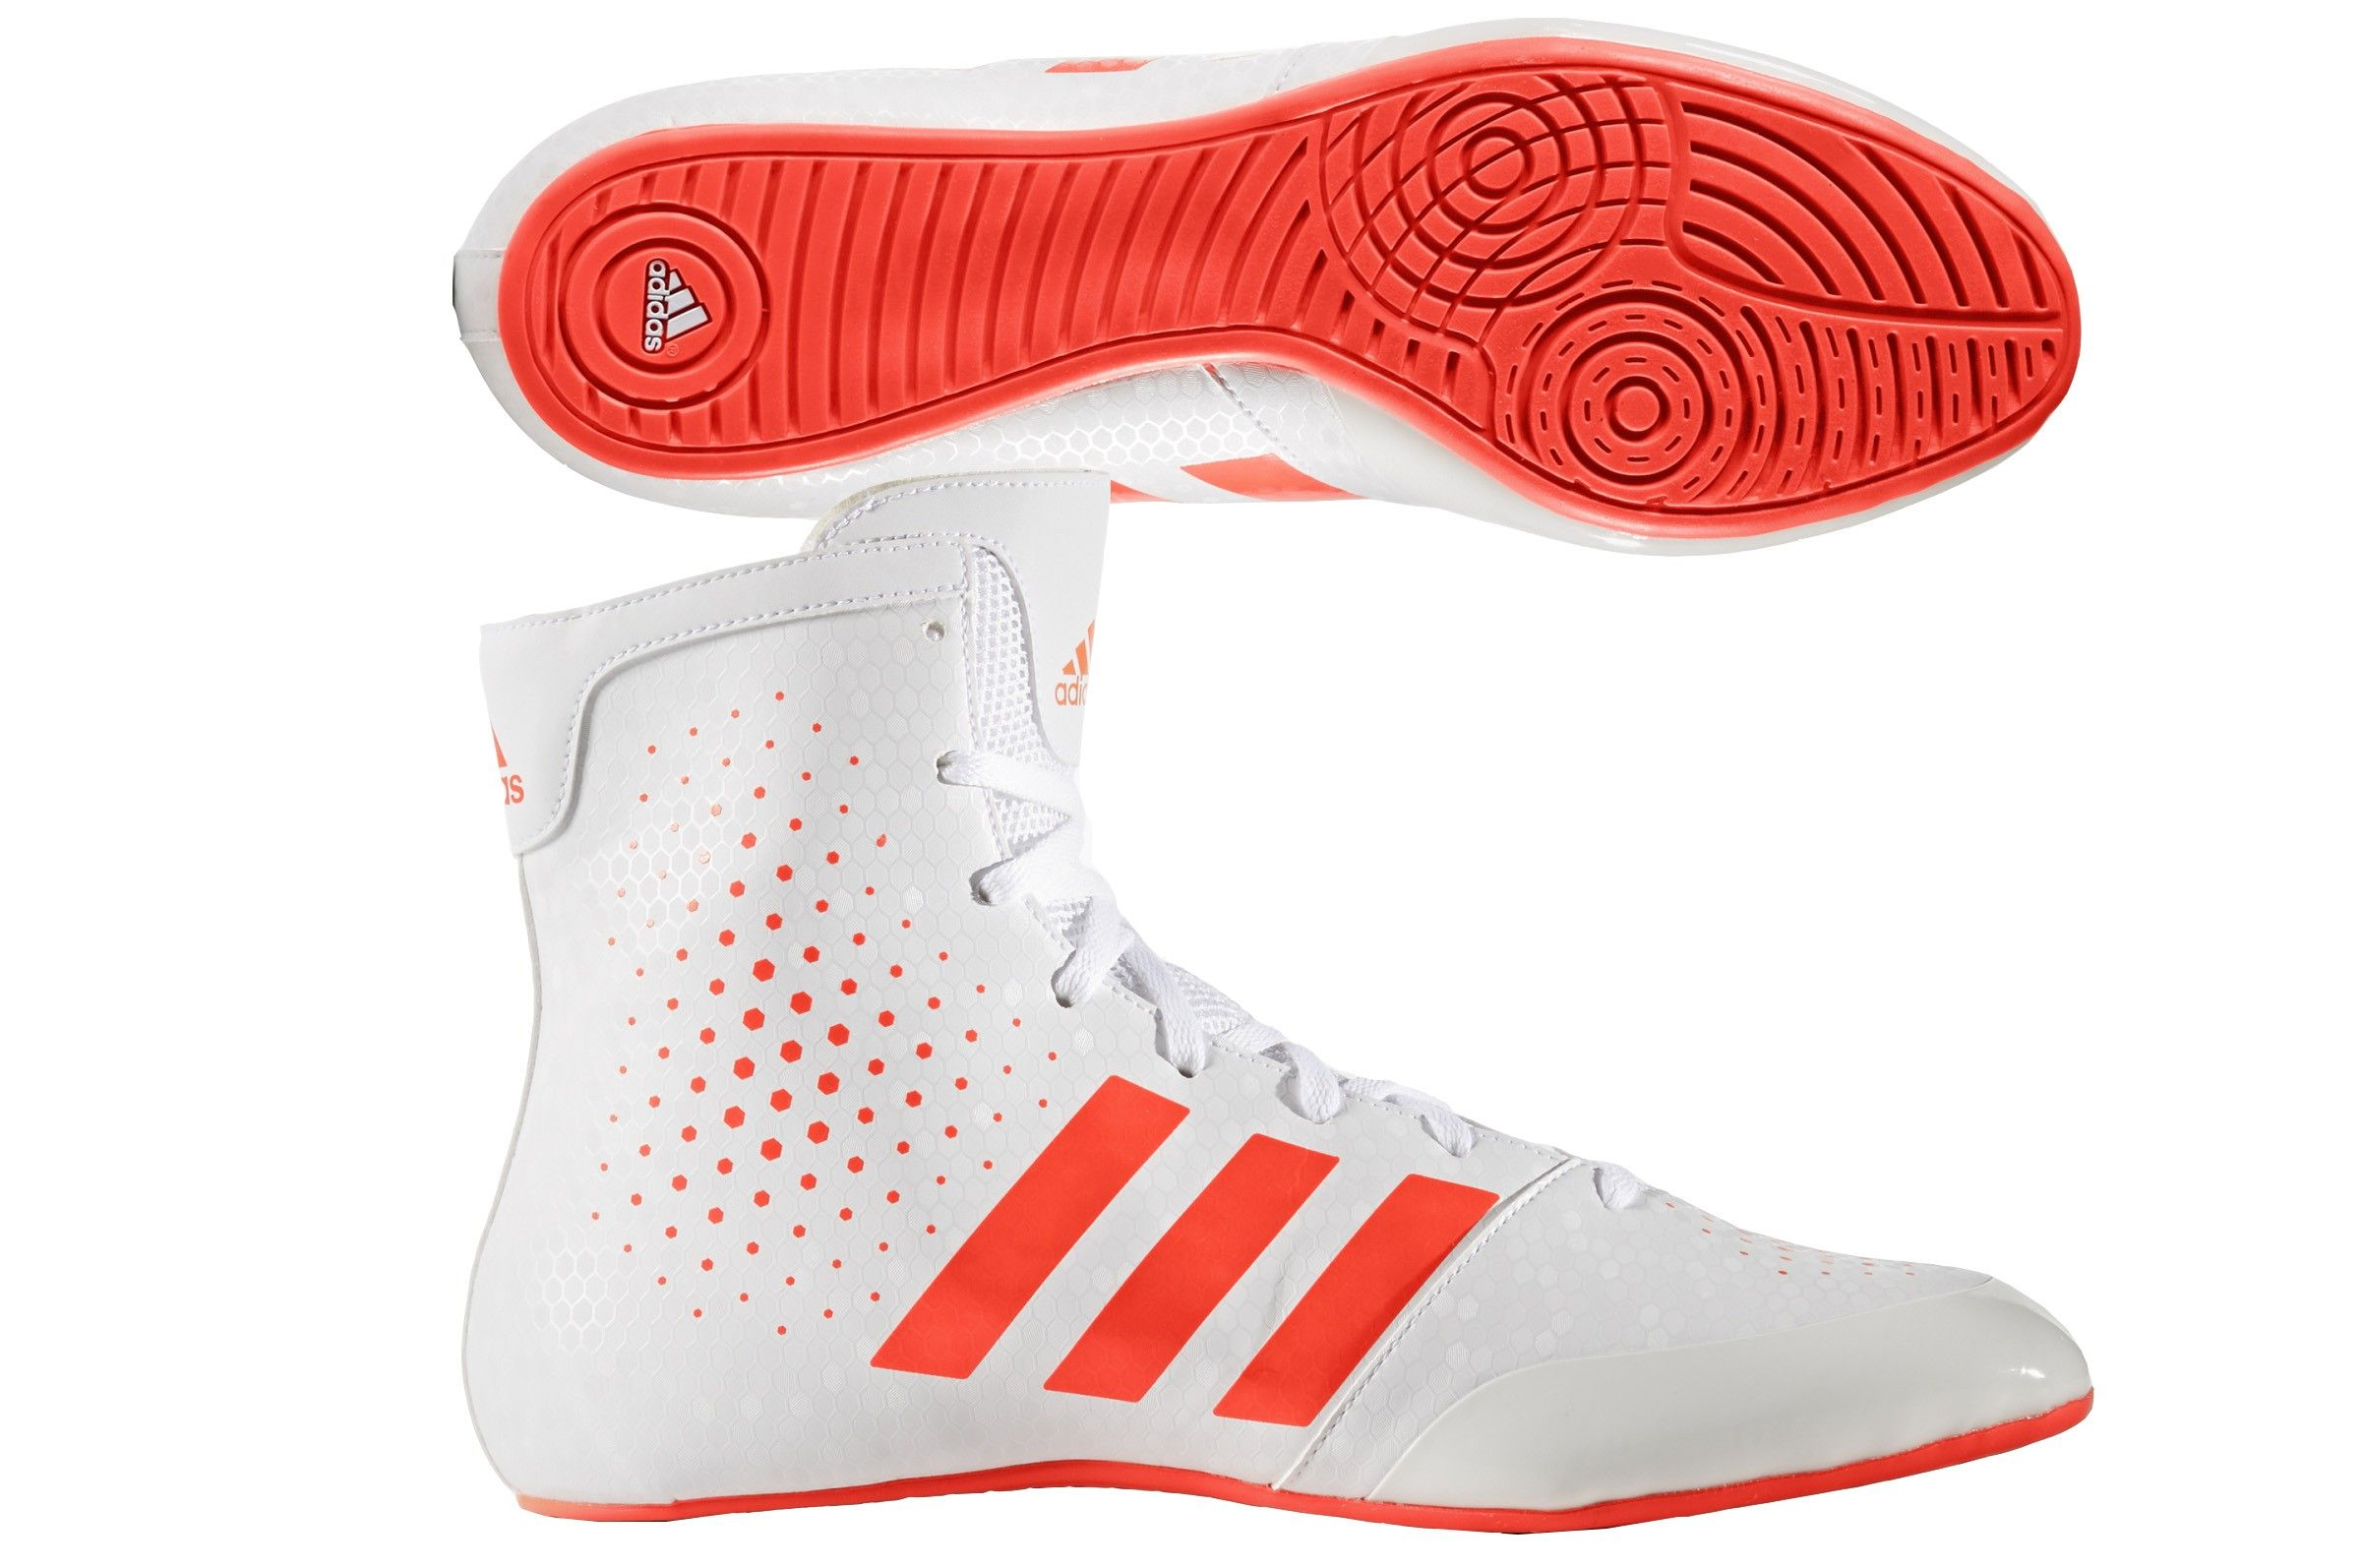 asics wrestling mat shoes nordstrom